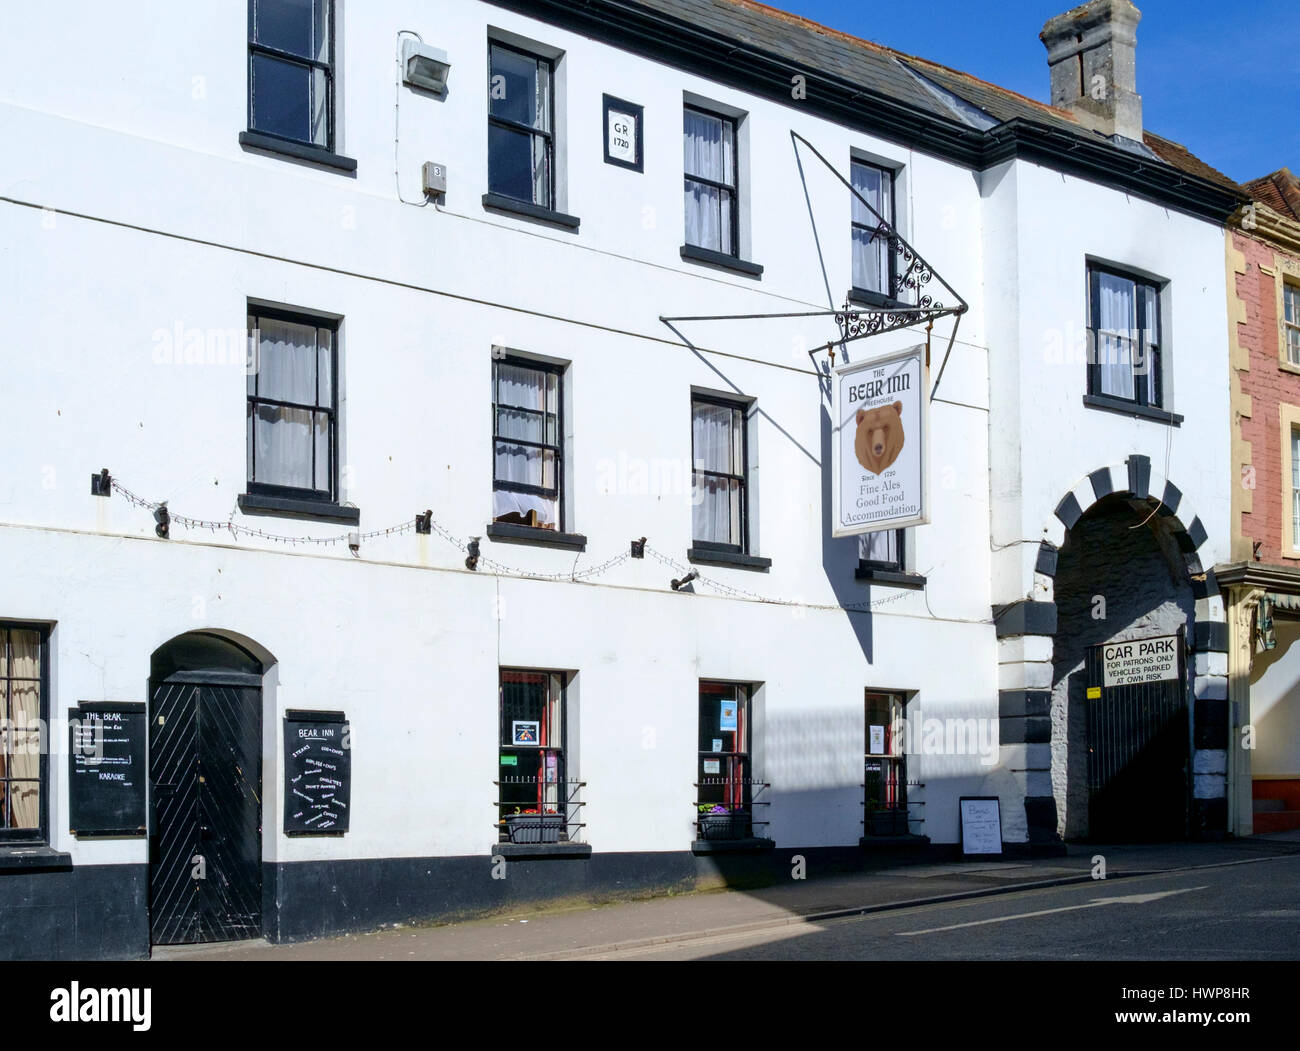 Views of Wincanton Town in somerset England UK. The Bear Inn - Stock Image